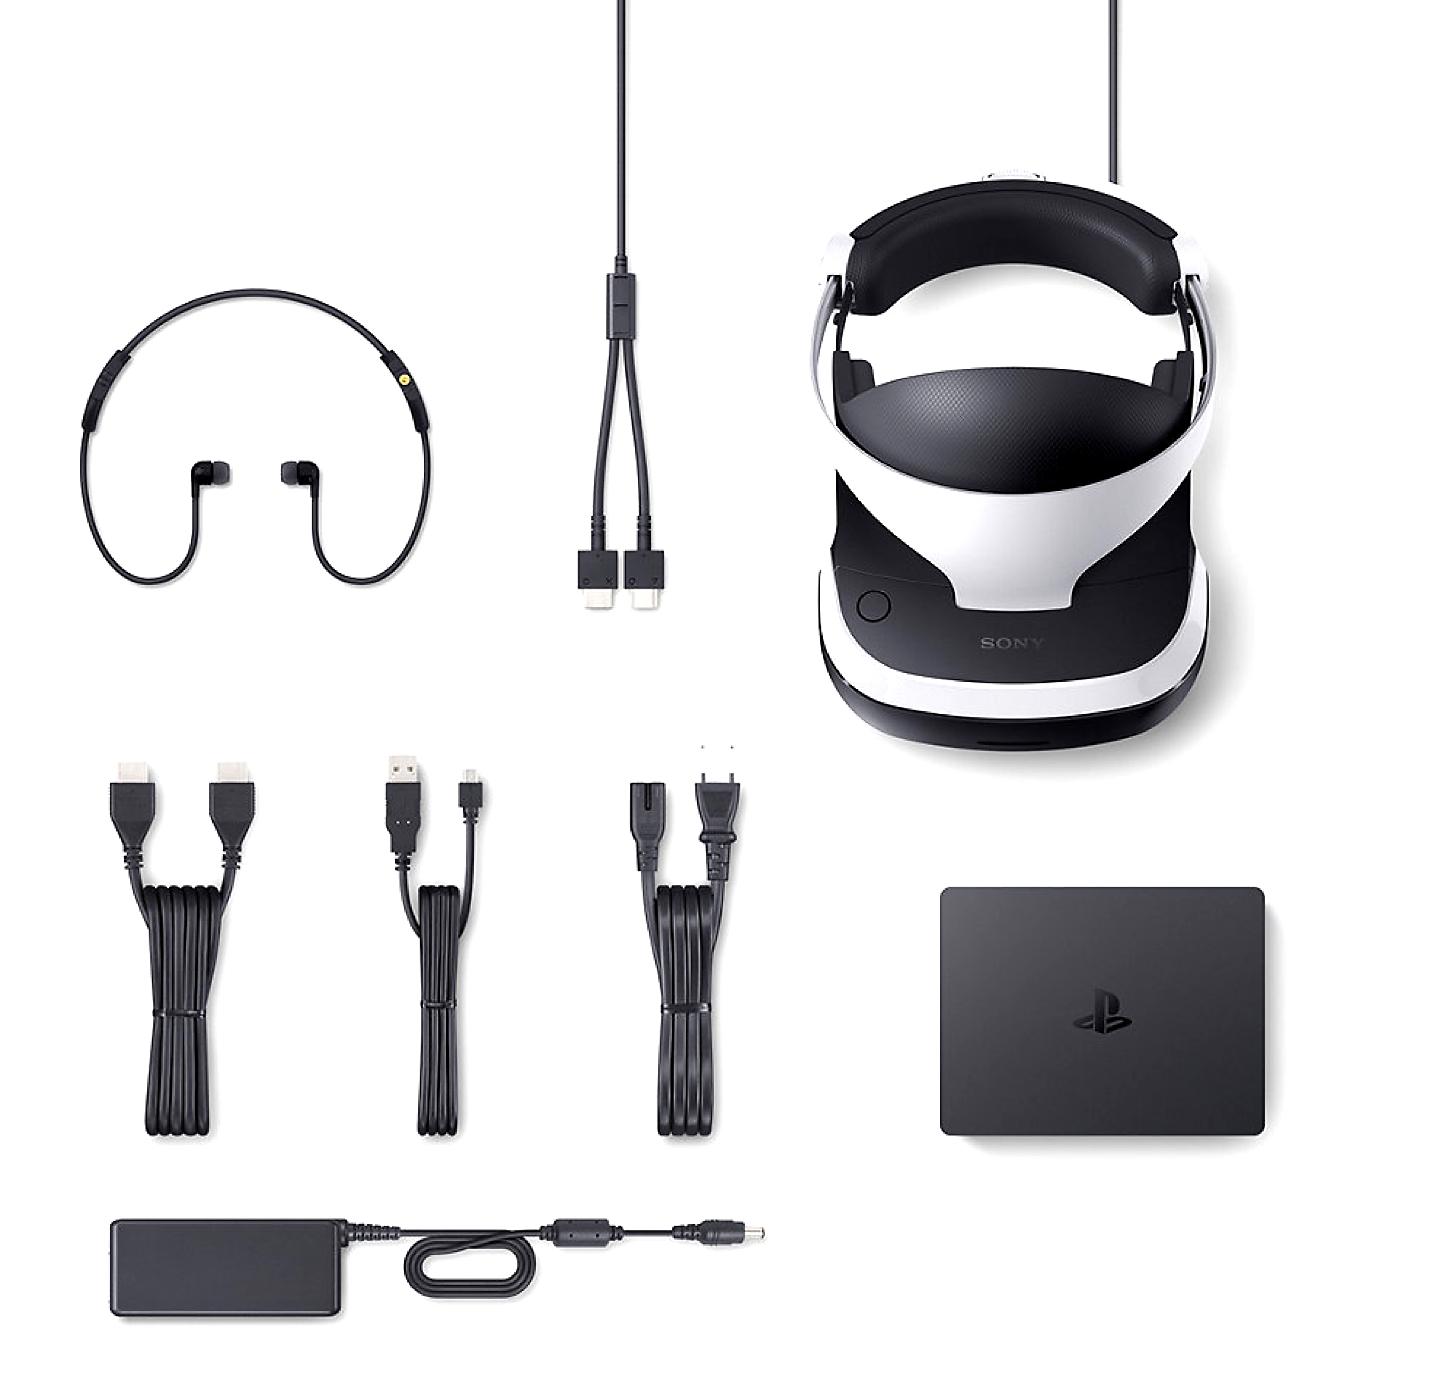 PlayStation VR hardware